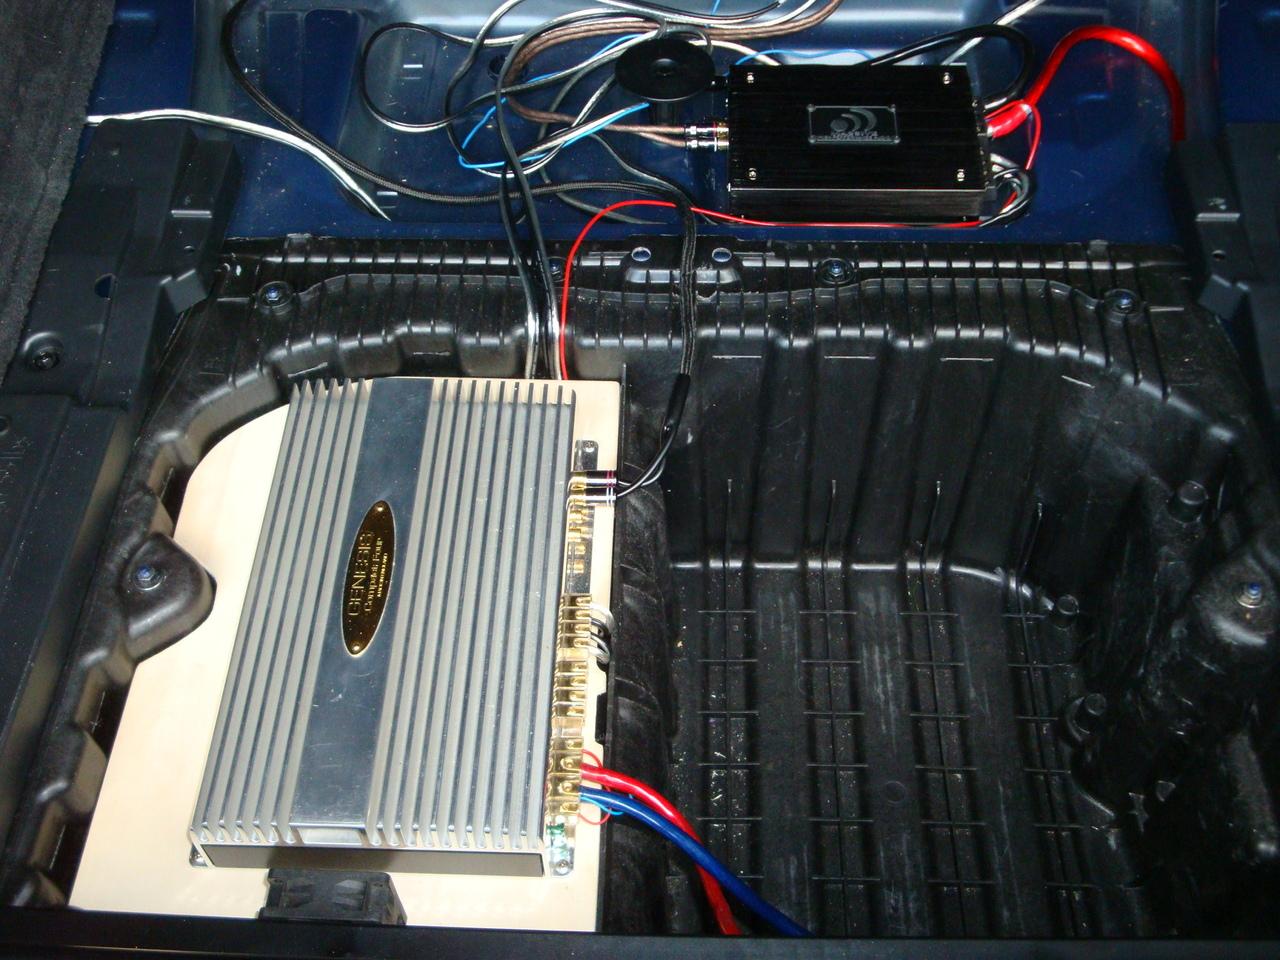 audio system r100 4 einbauort im e91 car hifi telefon. Black Bedroom Furniture Sets. Home Design Ideas